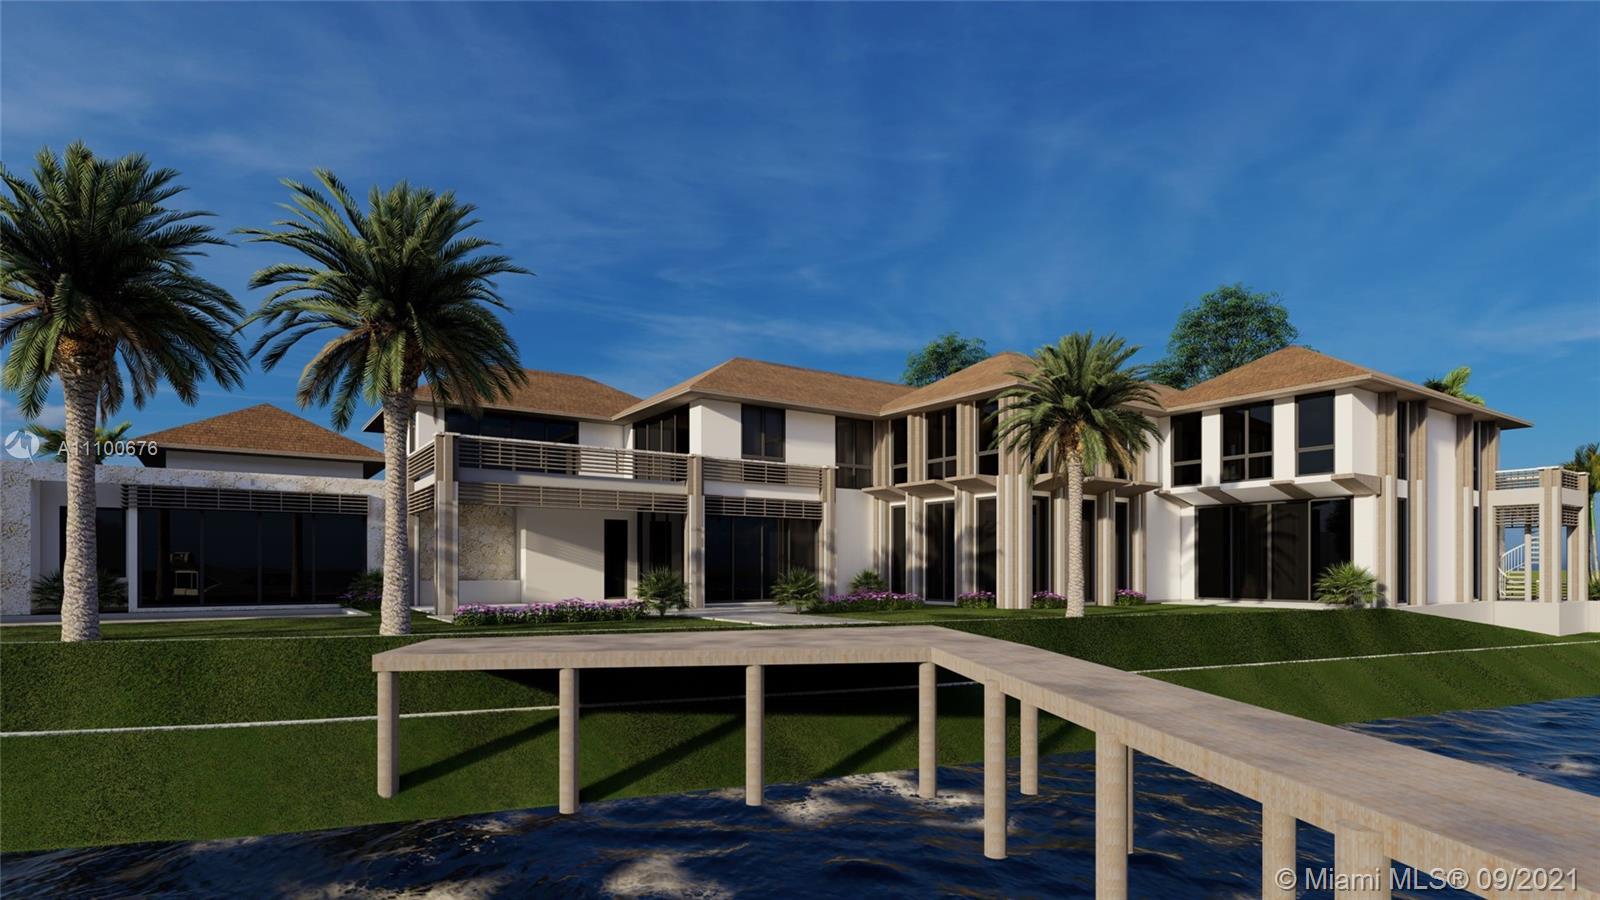 120 Spyglass Ln Luxury Real Estate